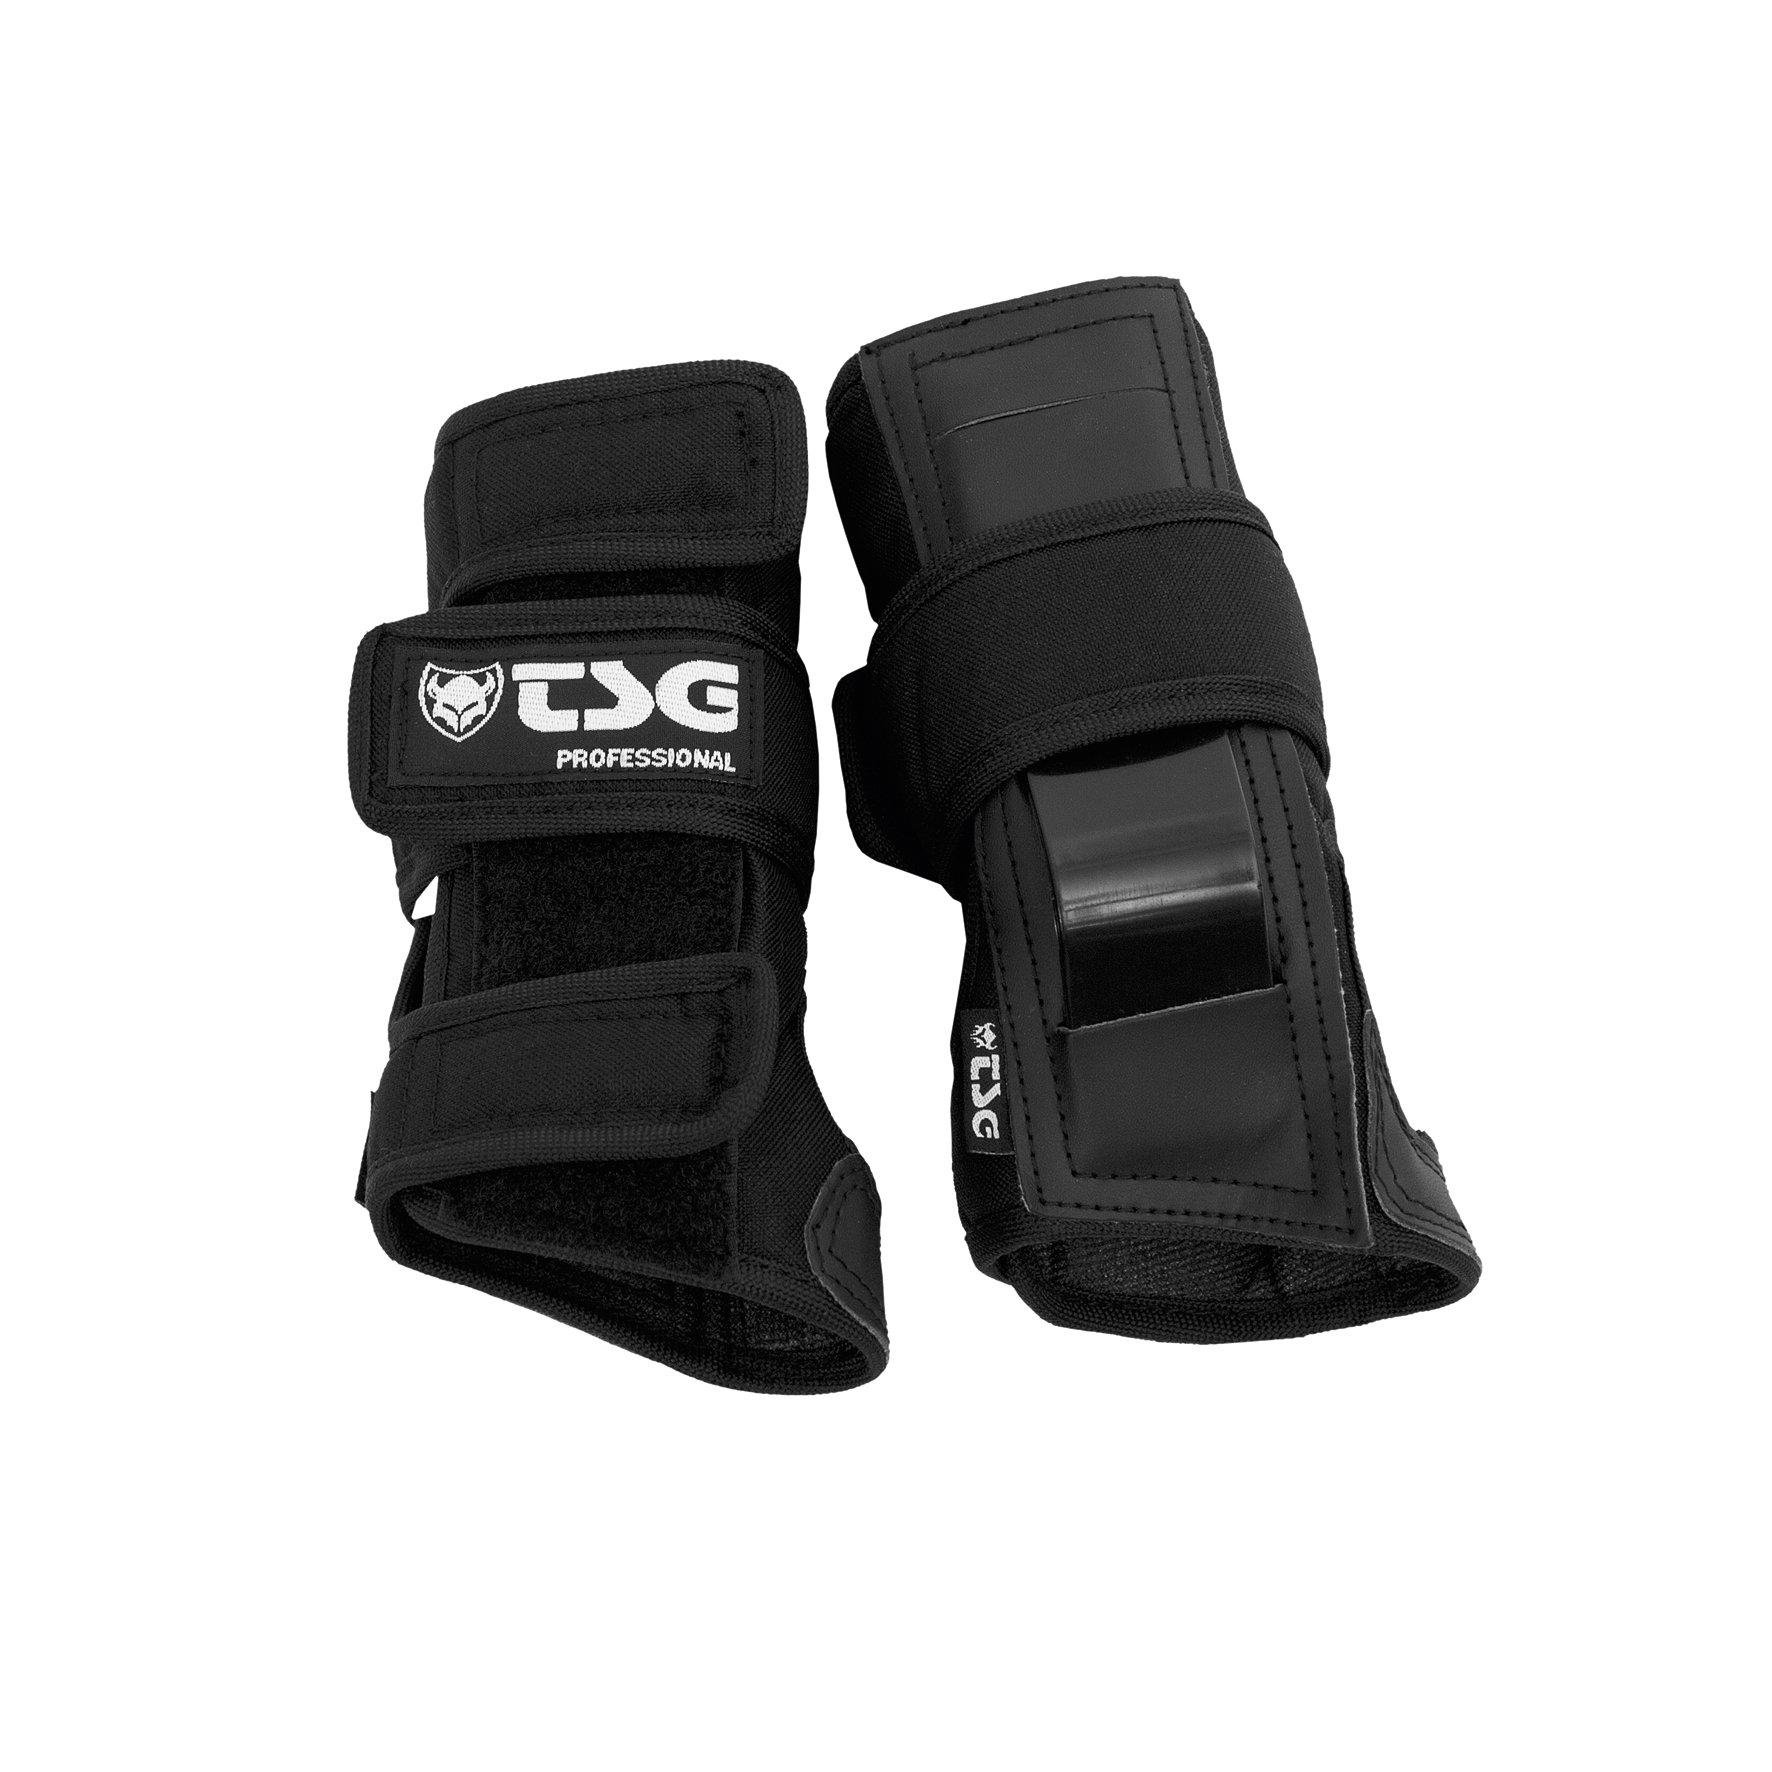 TSG Professional Wristguard (X-Large)